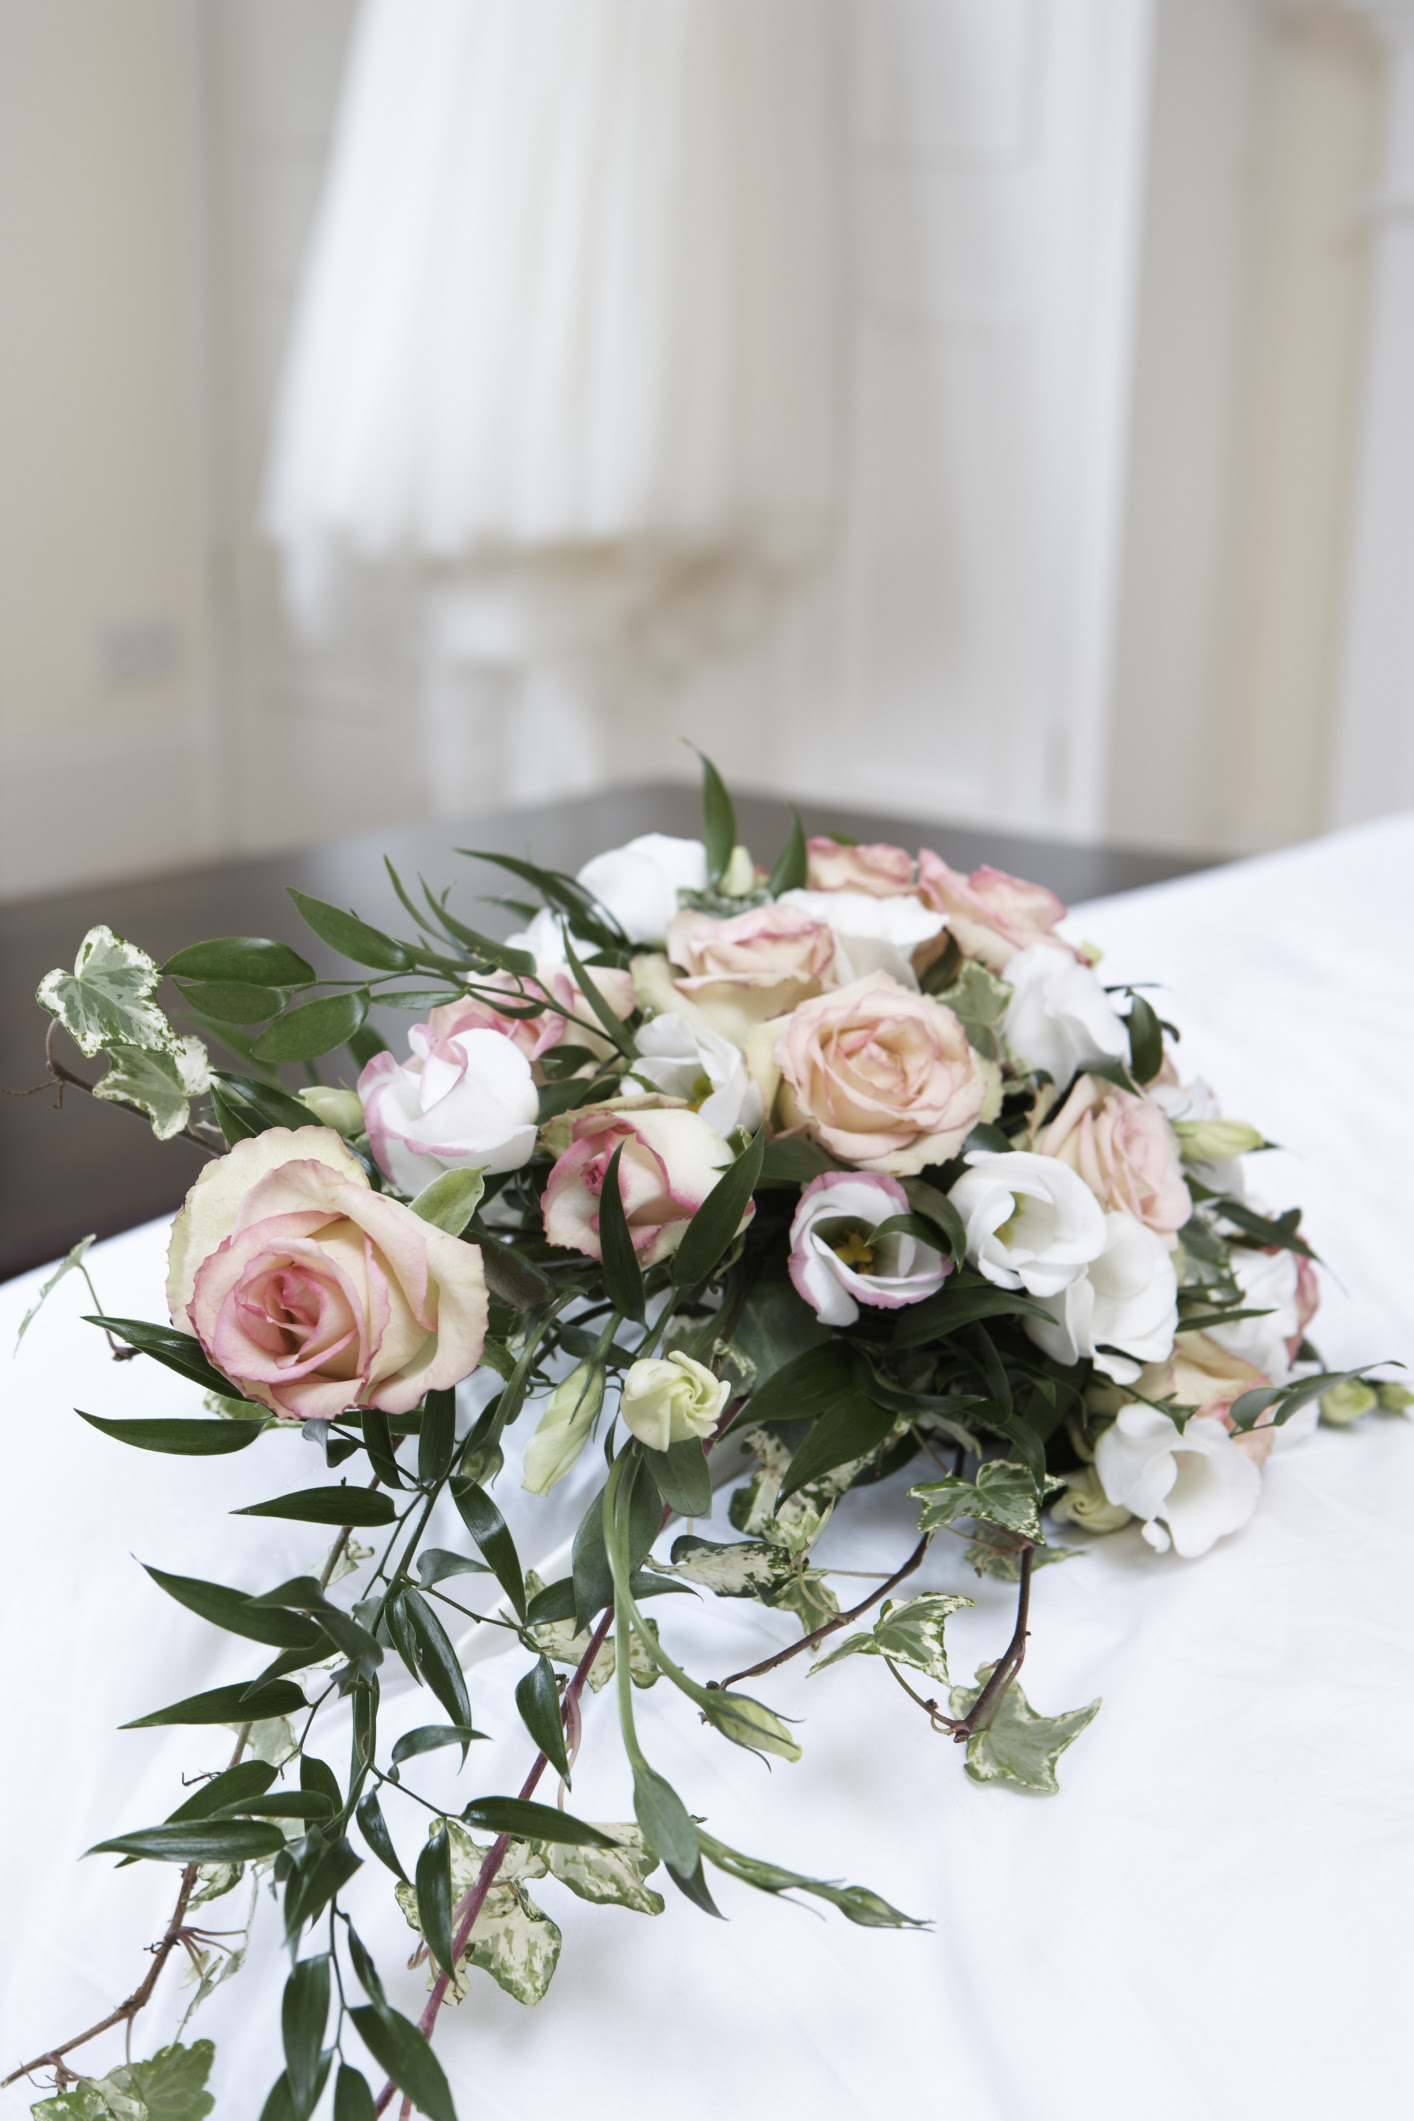 How To Make A Large Wedding Altar Flower Arrangement